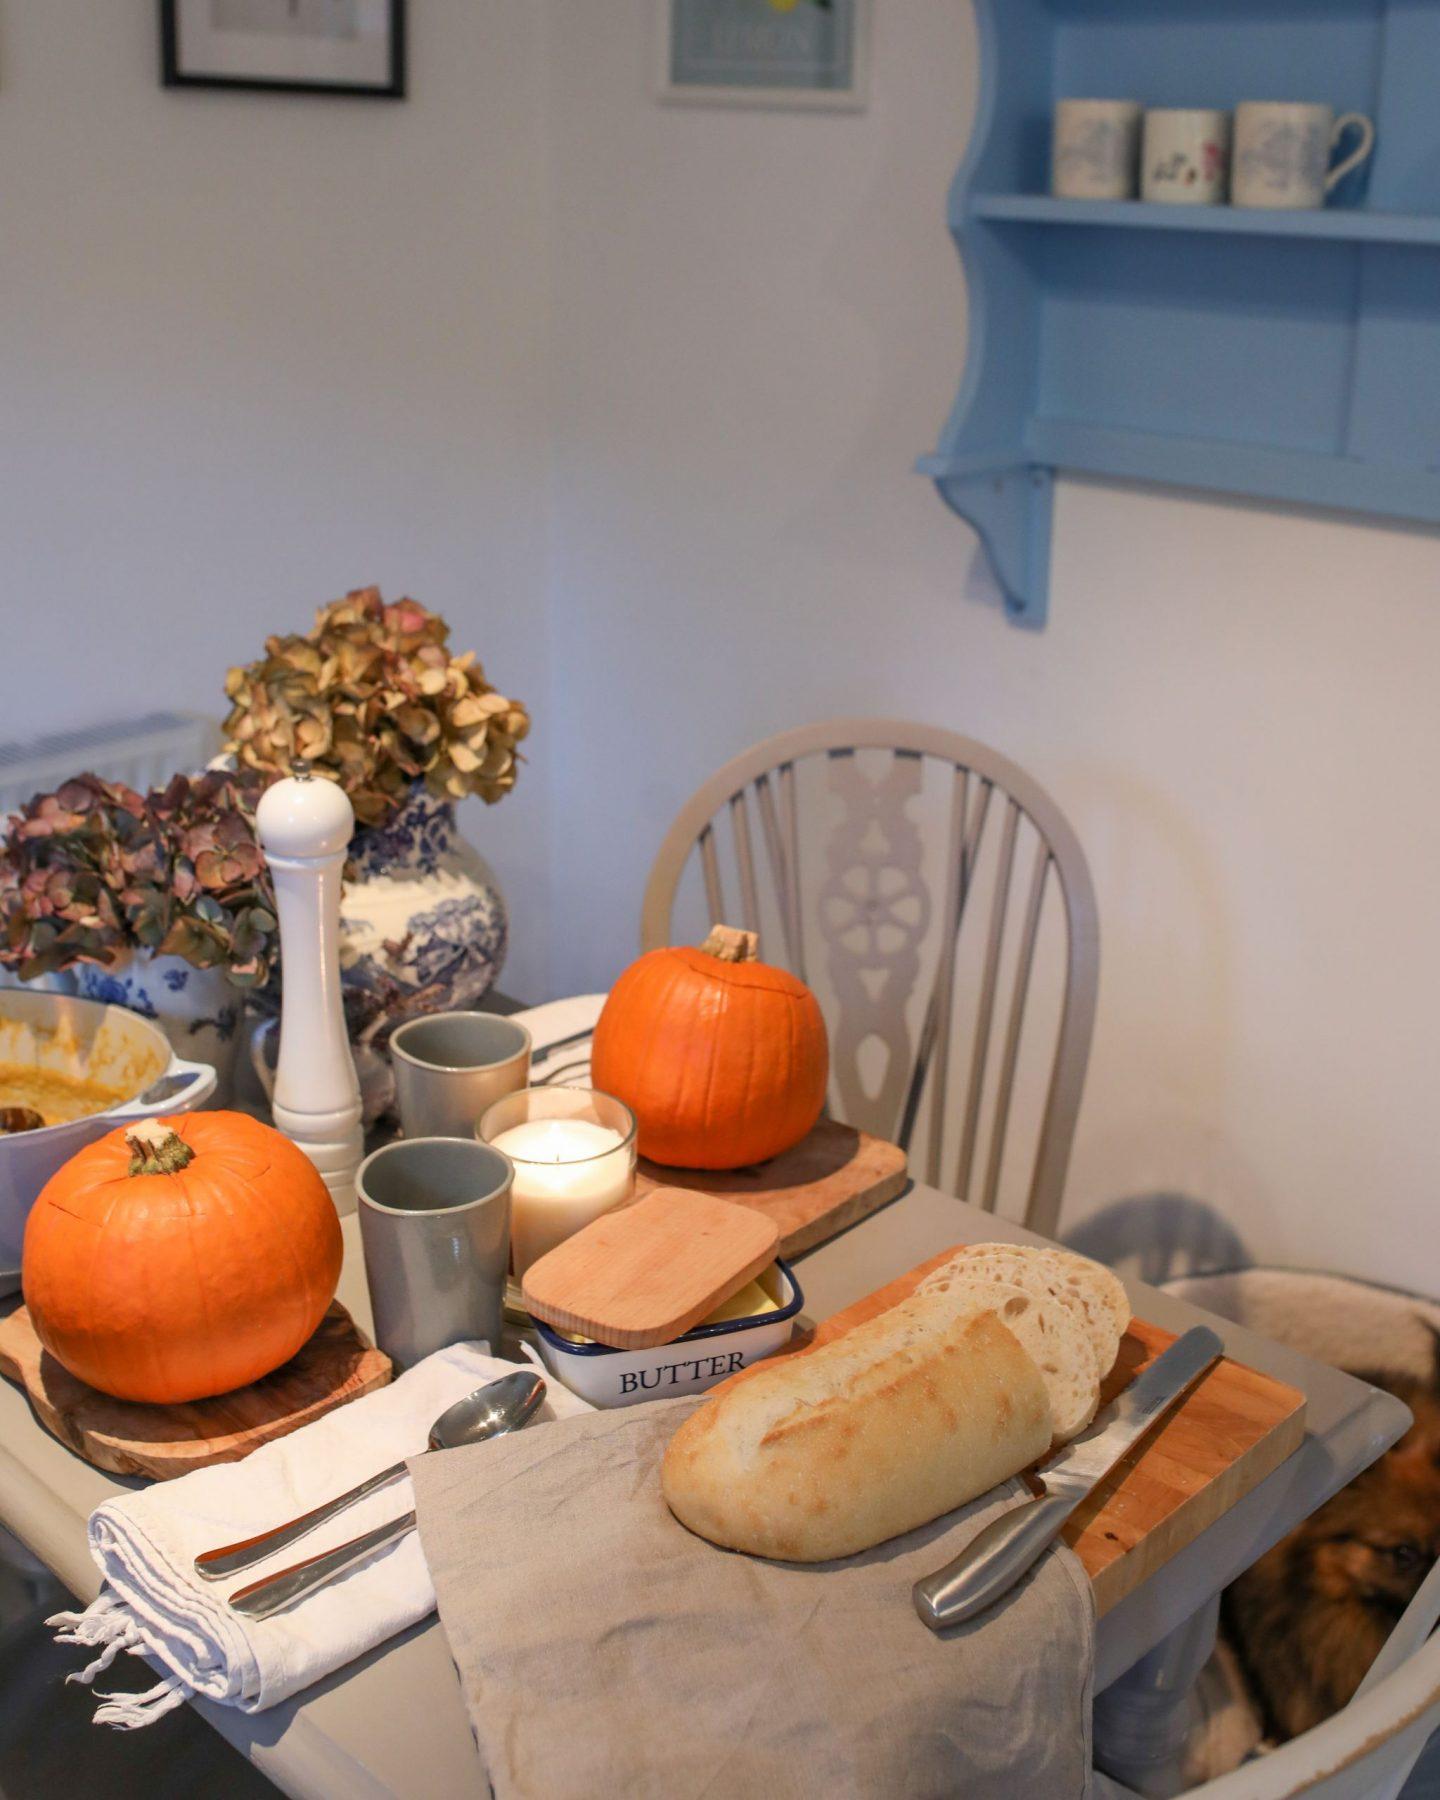 Parsnip, Sage and Pumpkin soup served in a pumpkin, Katie Heath, KALANCHOE